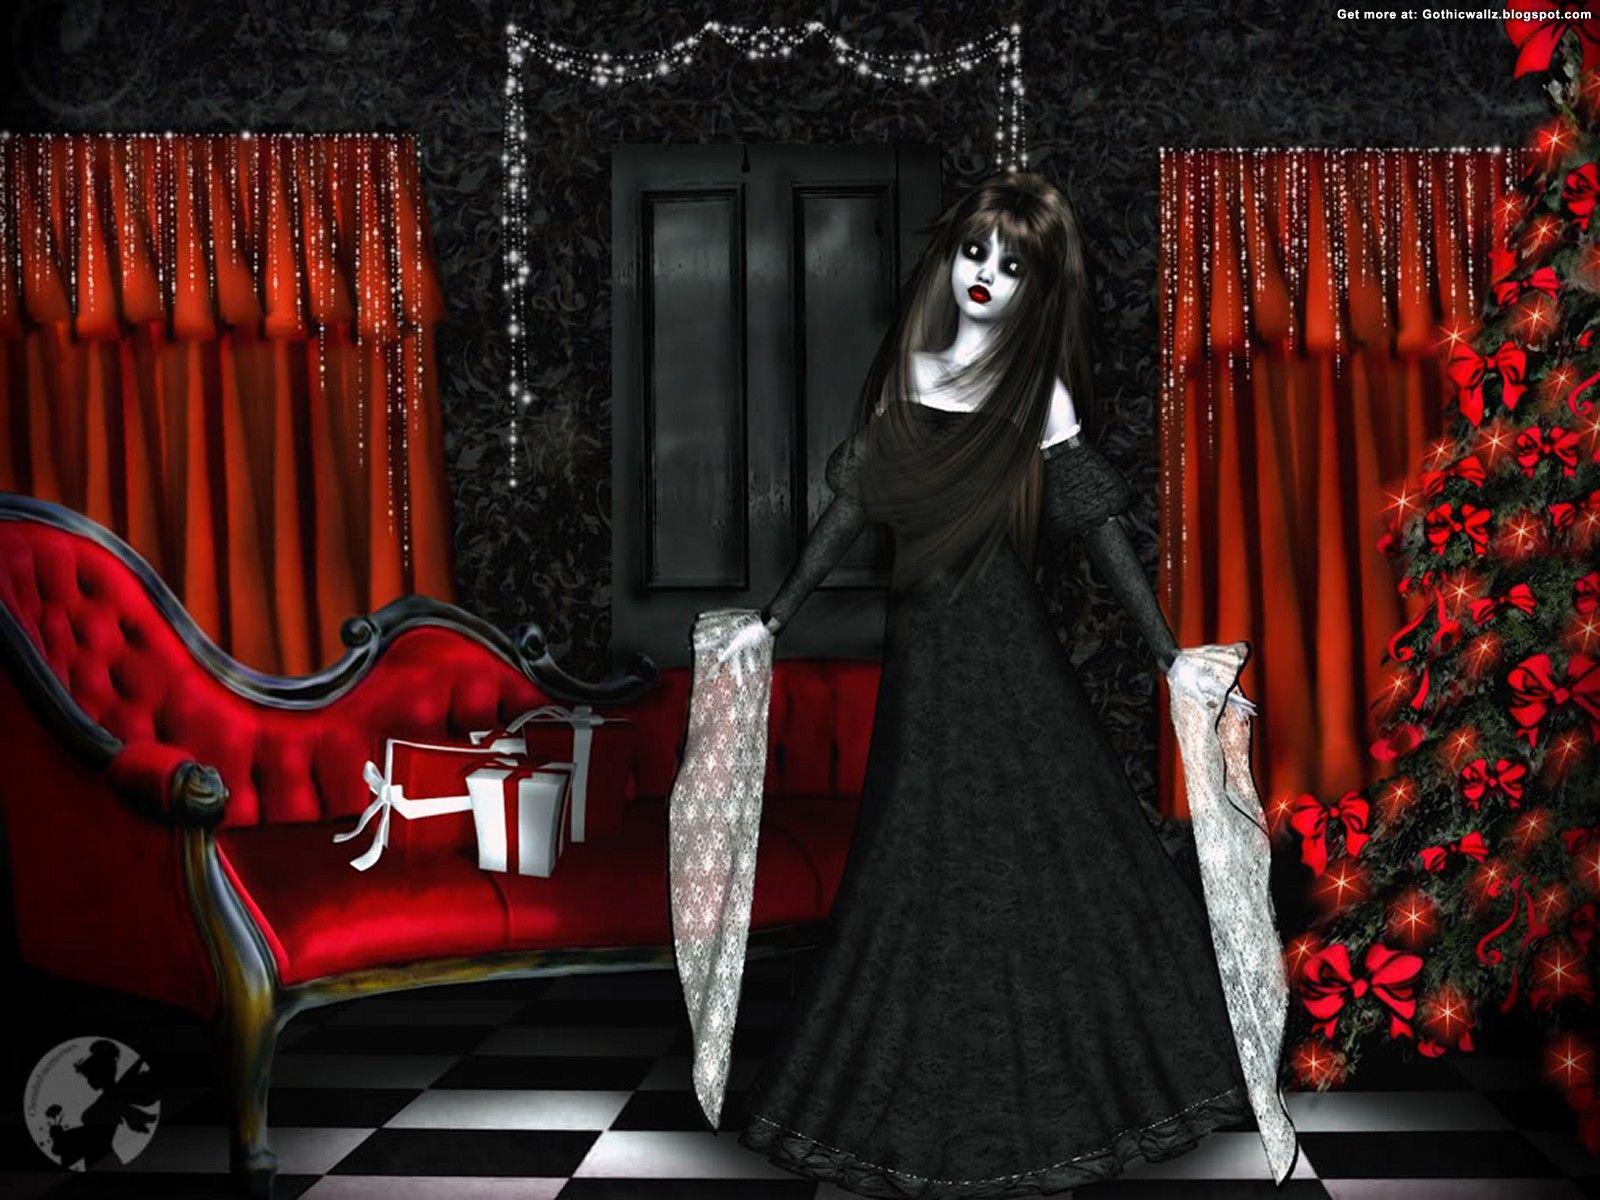 Gothic Christmas Decorations | Gothic Christmas 1 | Gothic ...